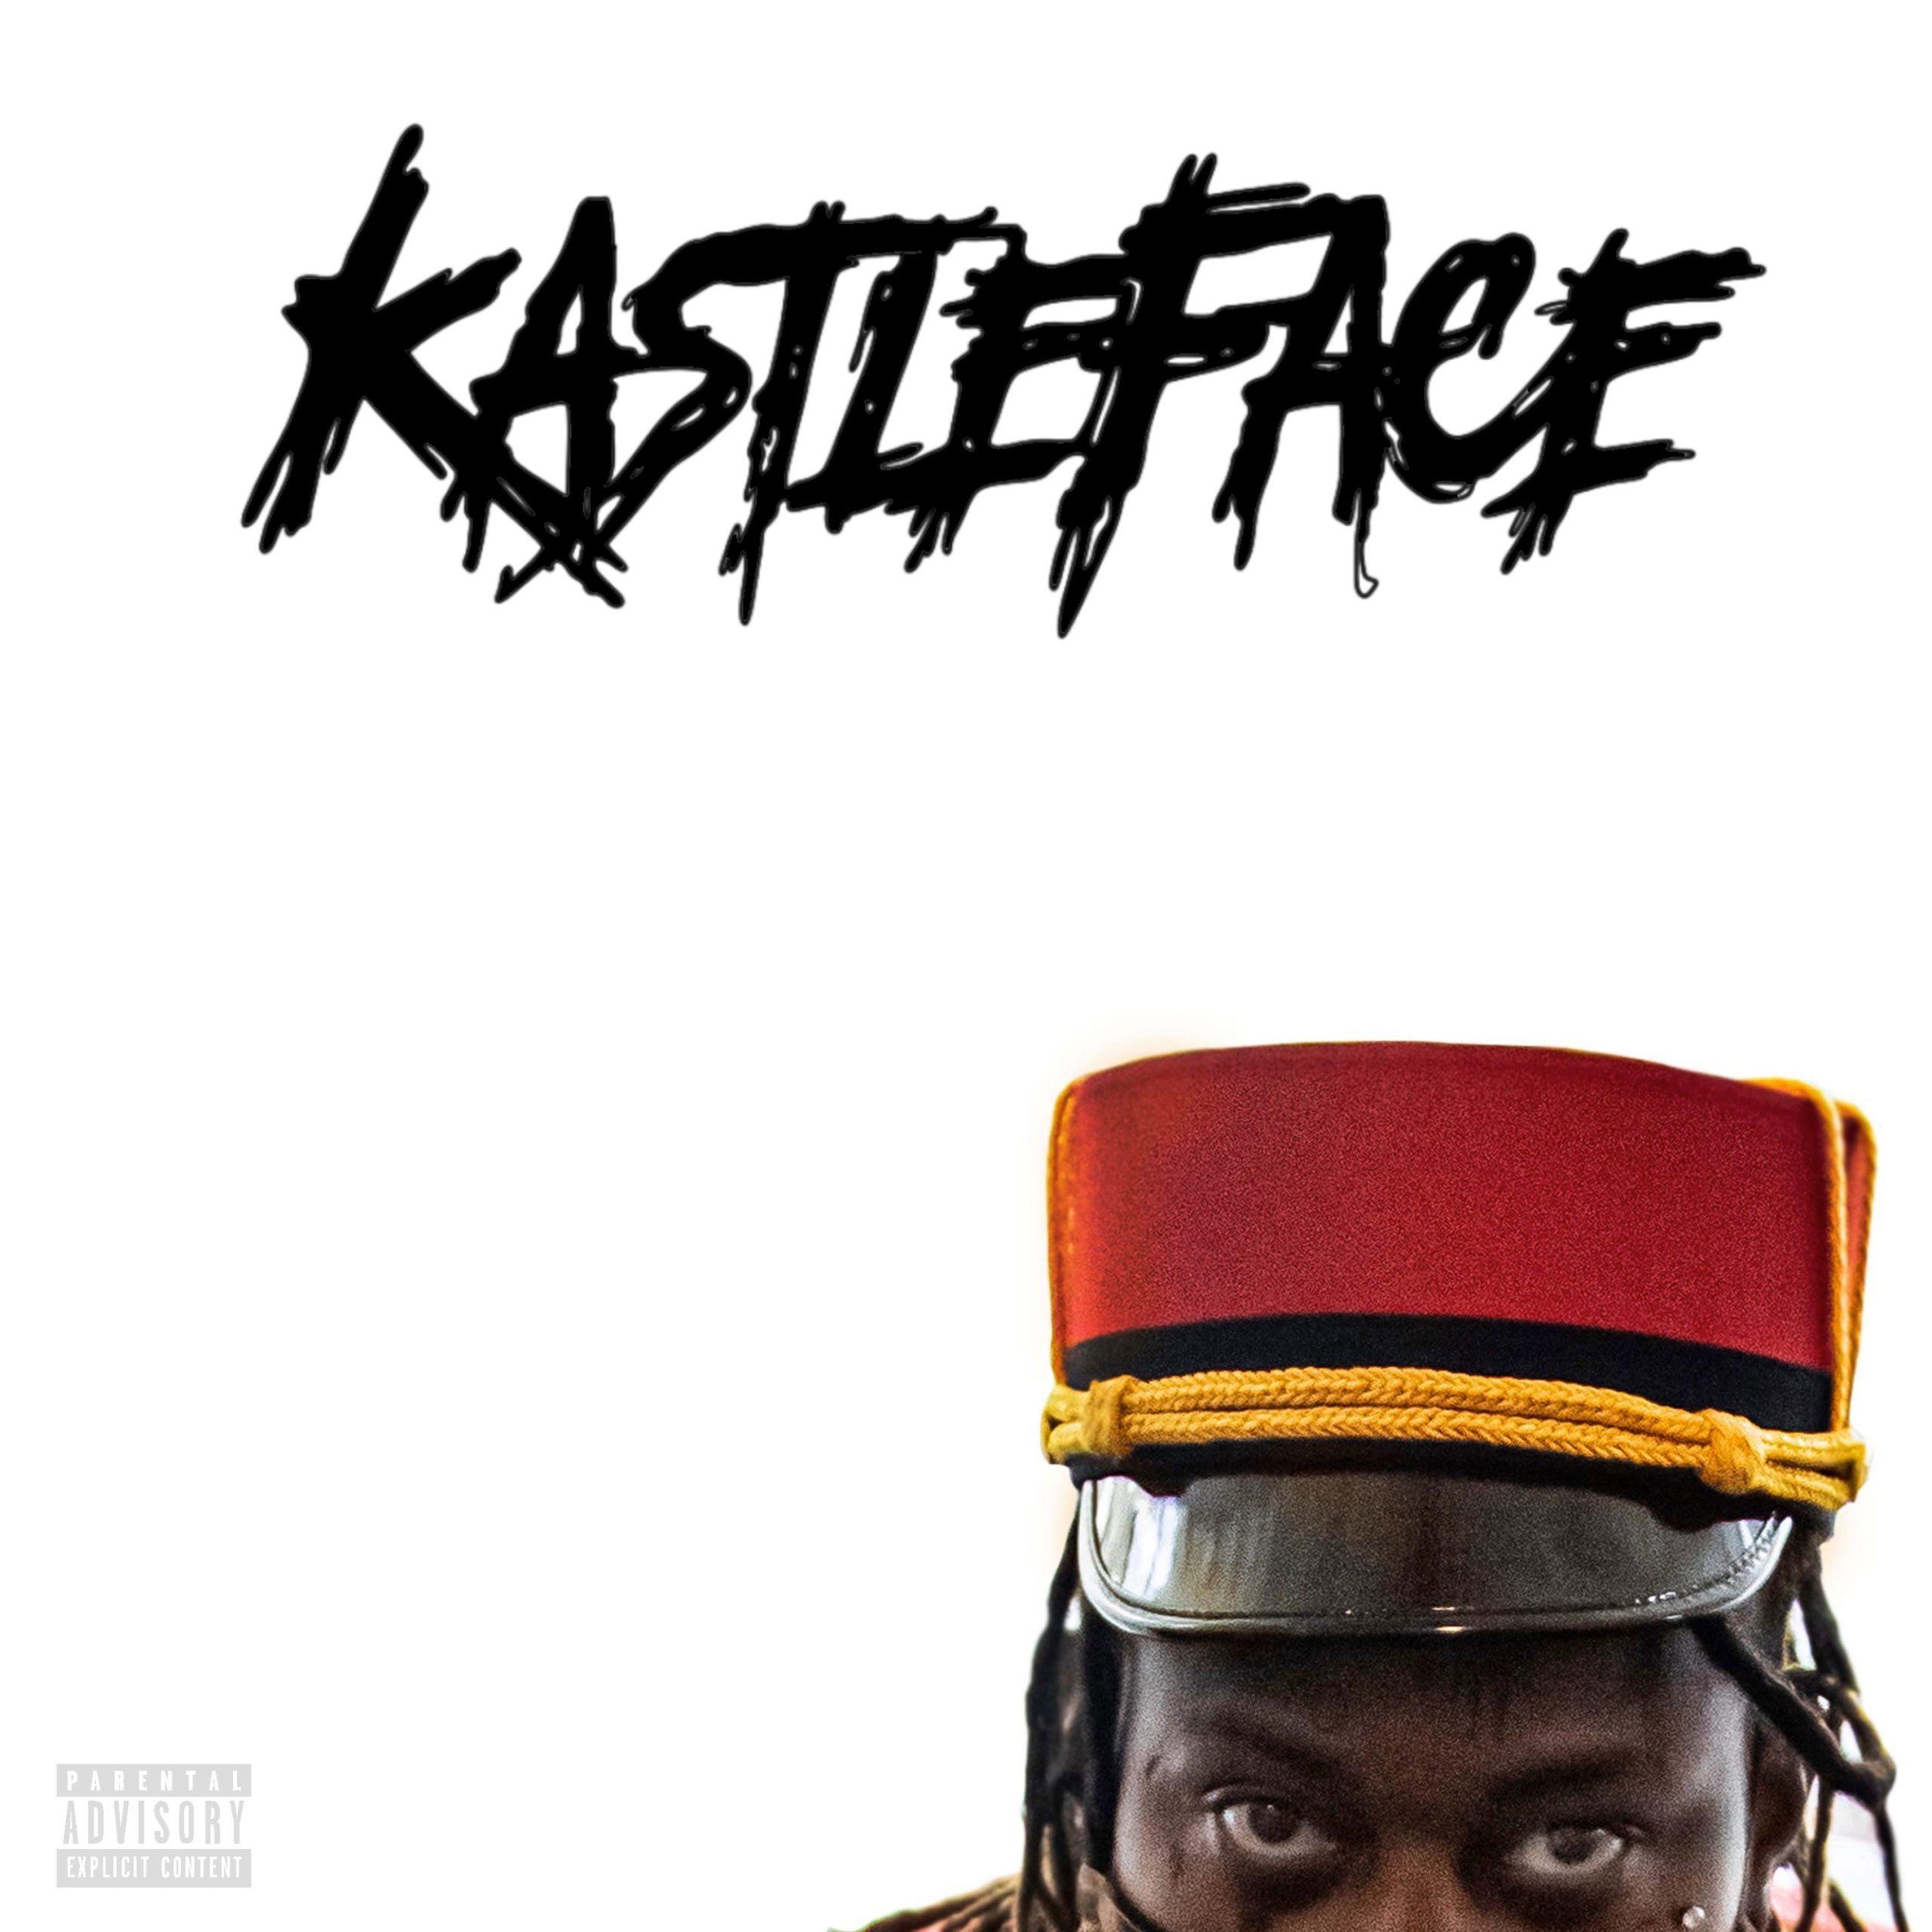 KastleFace